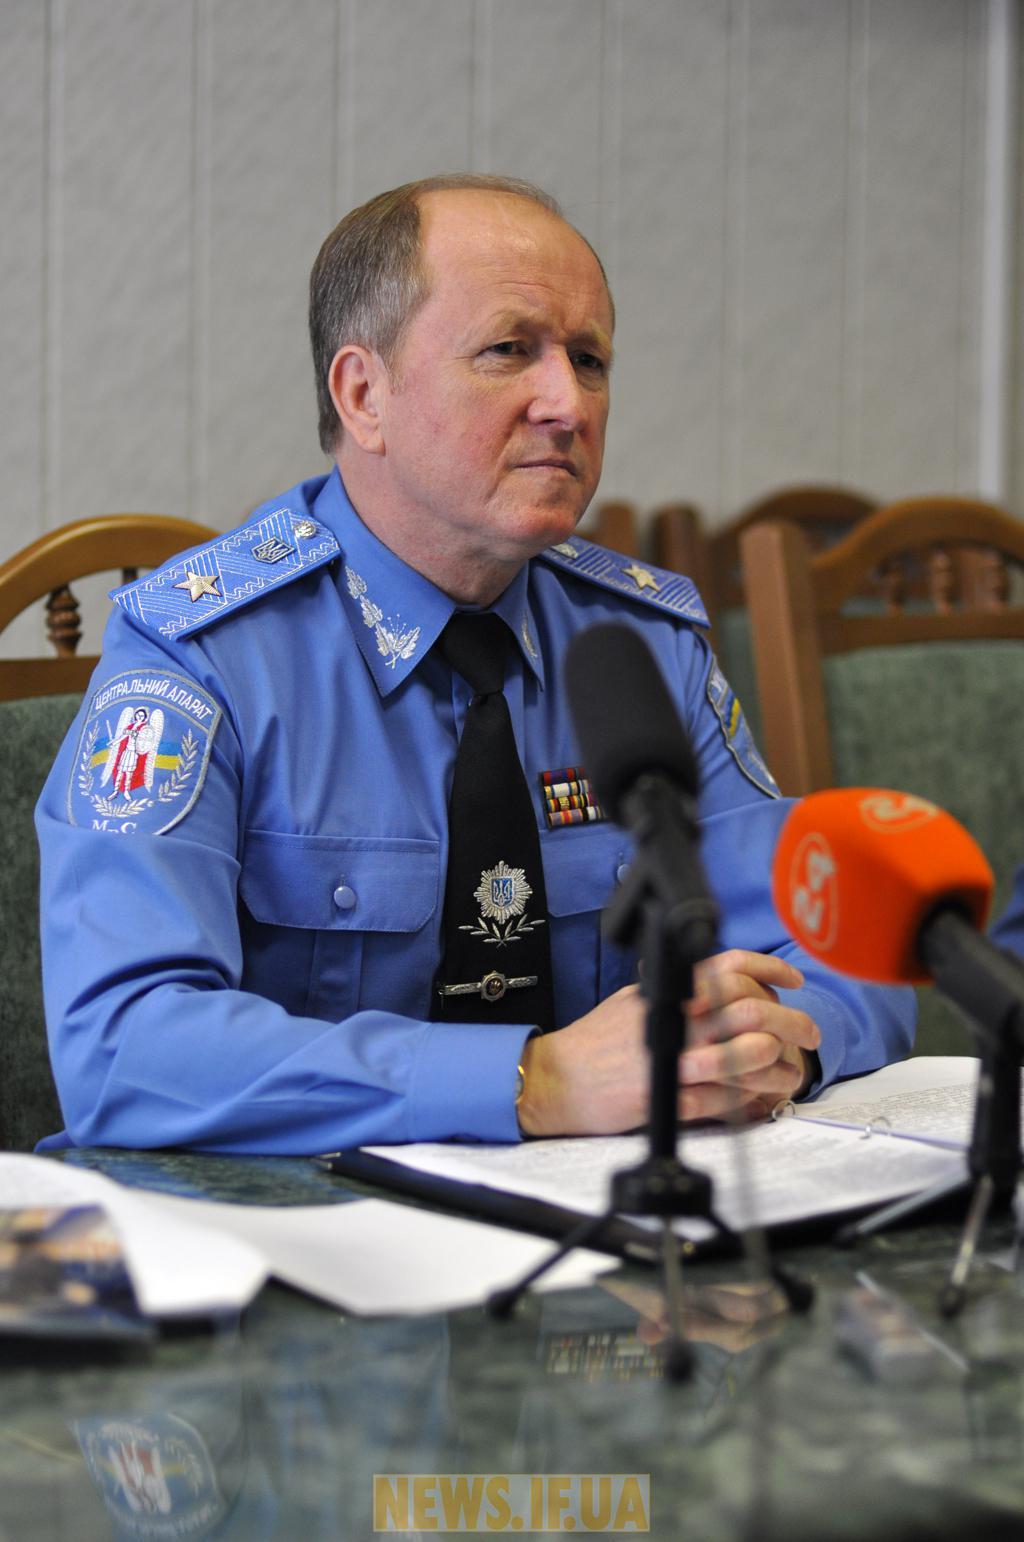 http://news.if.ua/images/news/10/05/31/big_DSC_0764.JPG